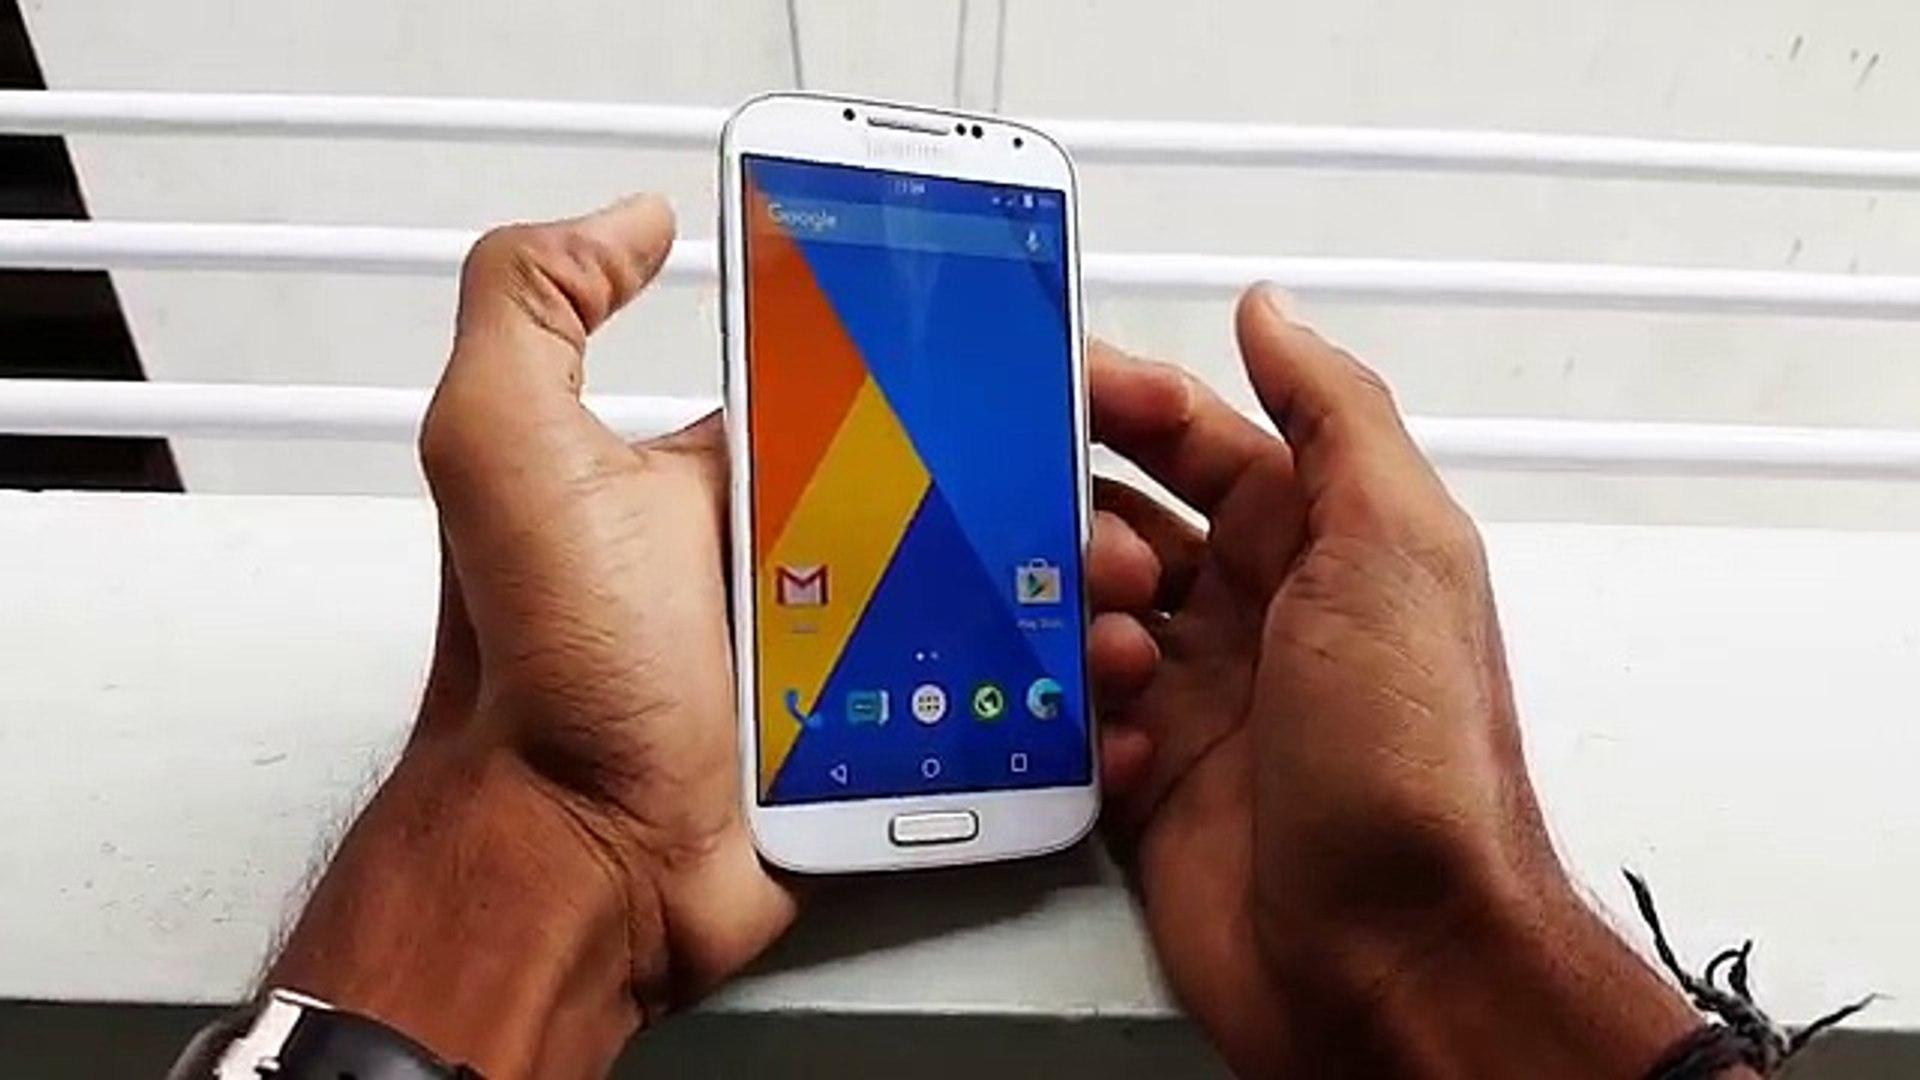 How to install MIUI 7 ROM on Galaxy S4 I9500